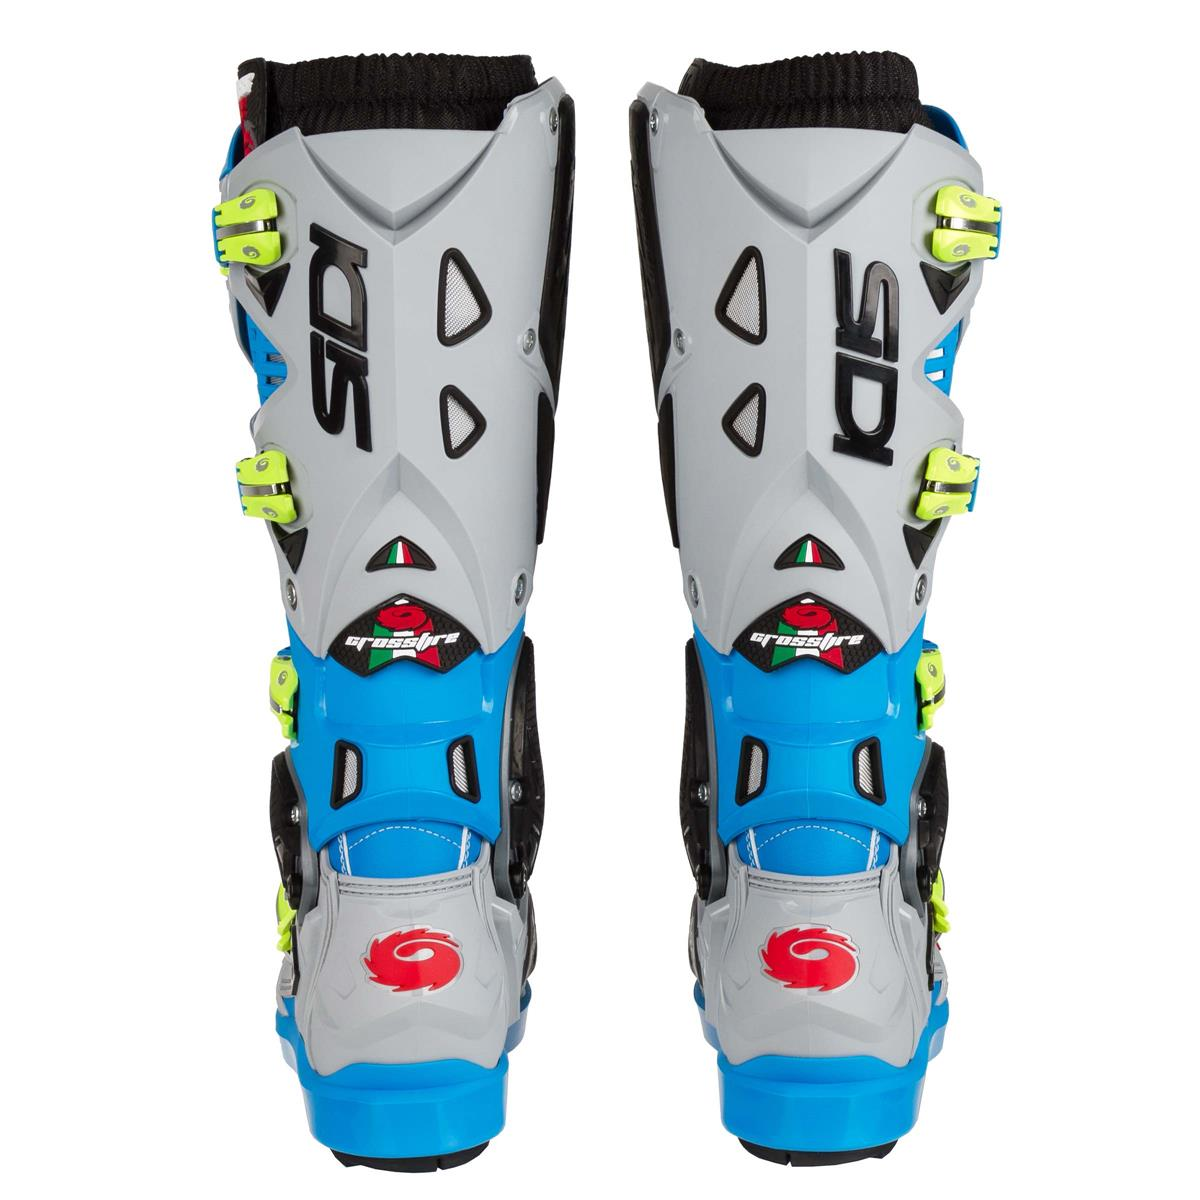 sidi-motocross-stiefel-mx-boots-crossfire-3-srs-5 (1)